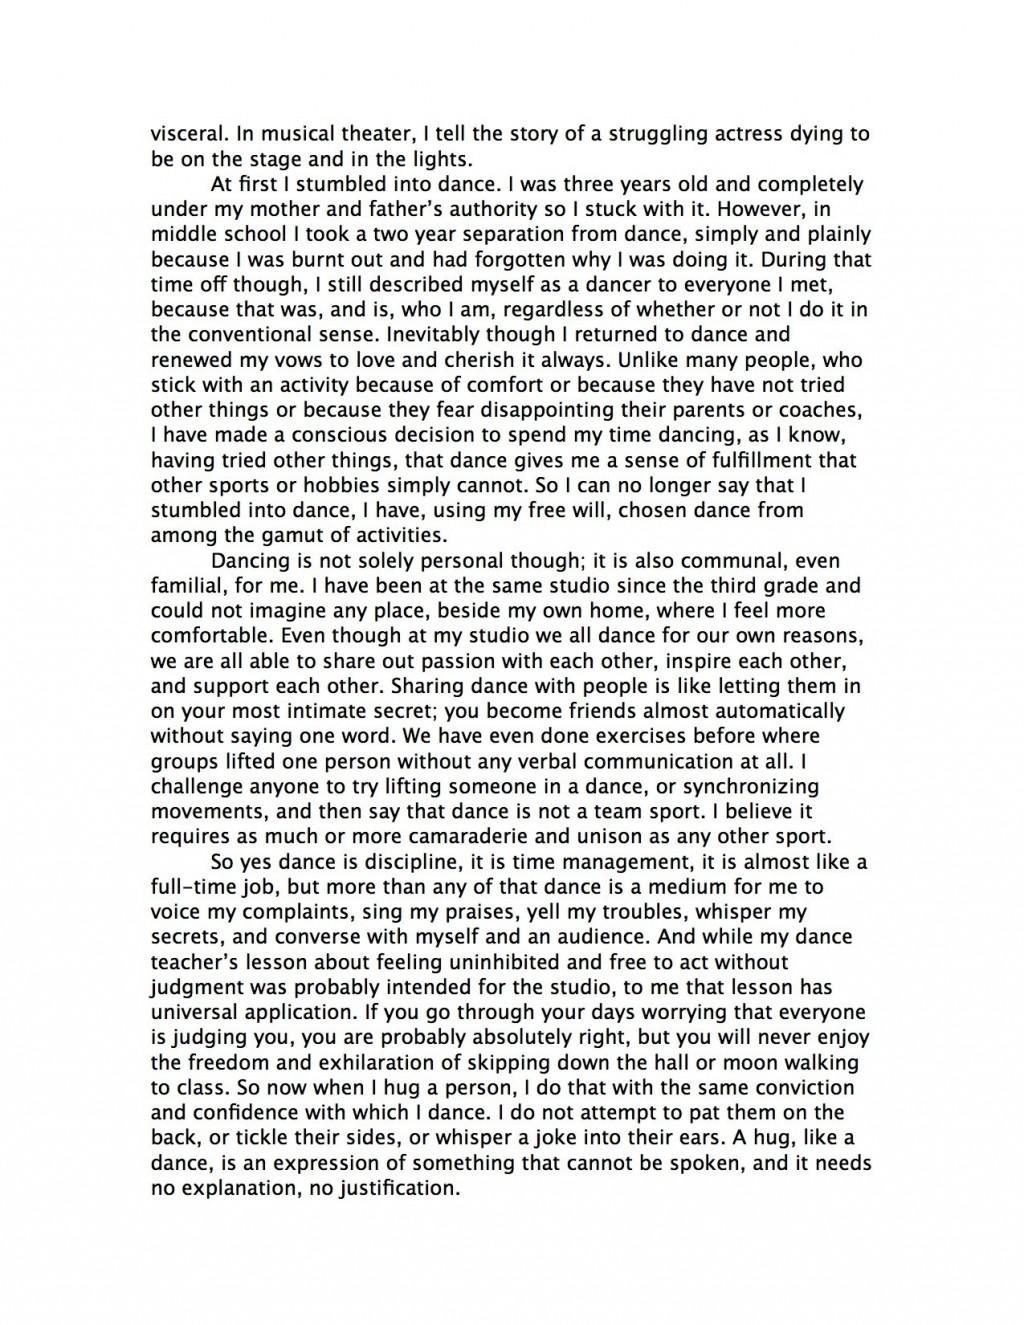 016 Rebecca Nueman Dance Essay Rough1 Frightening Jazz Topics Scholarships Conclusion Large